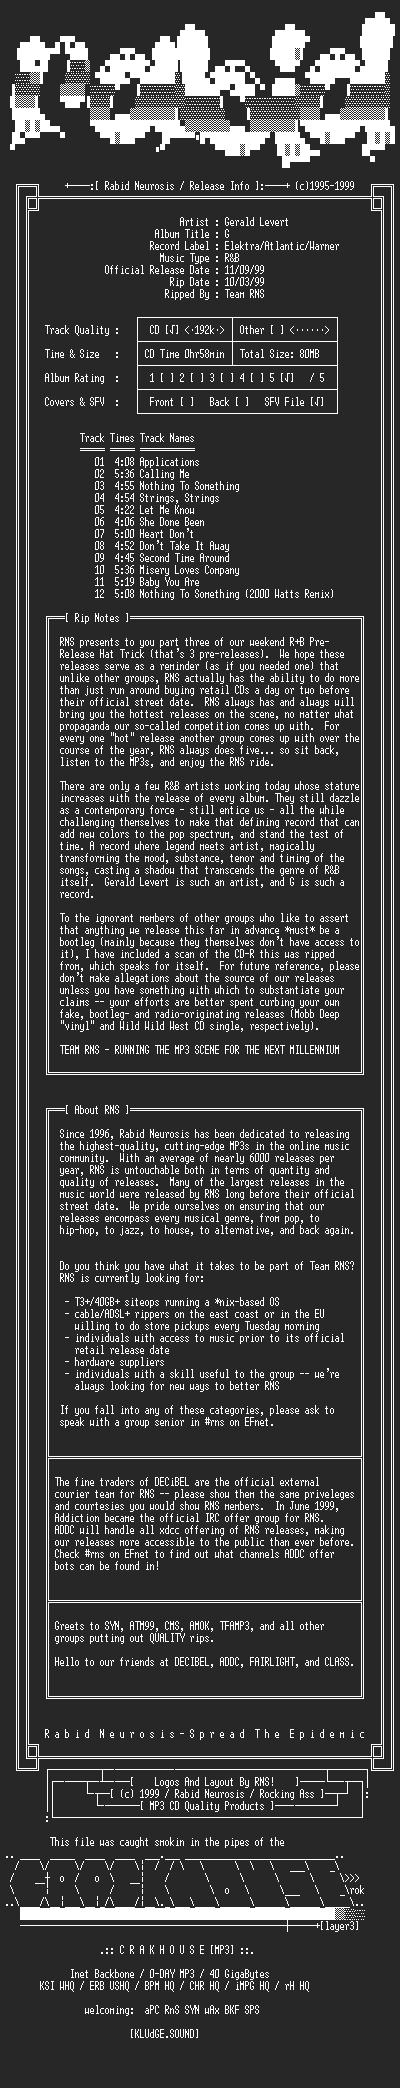 NFO file for Gerald_Levert-G-1999-RNS